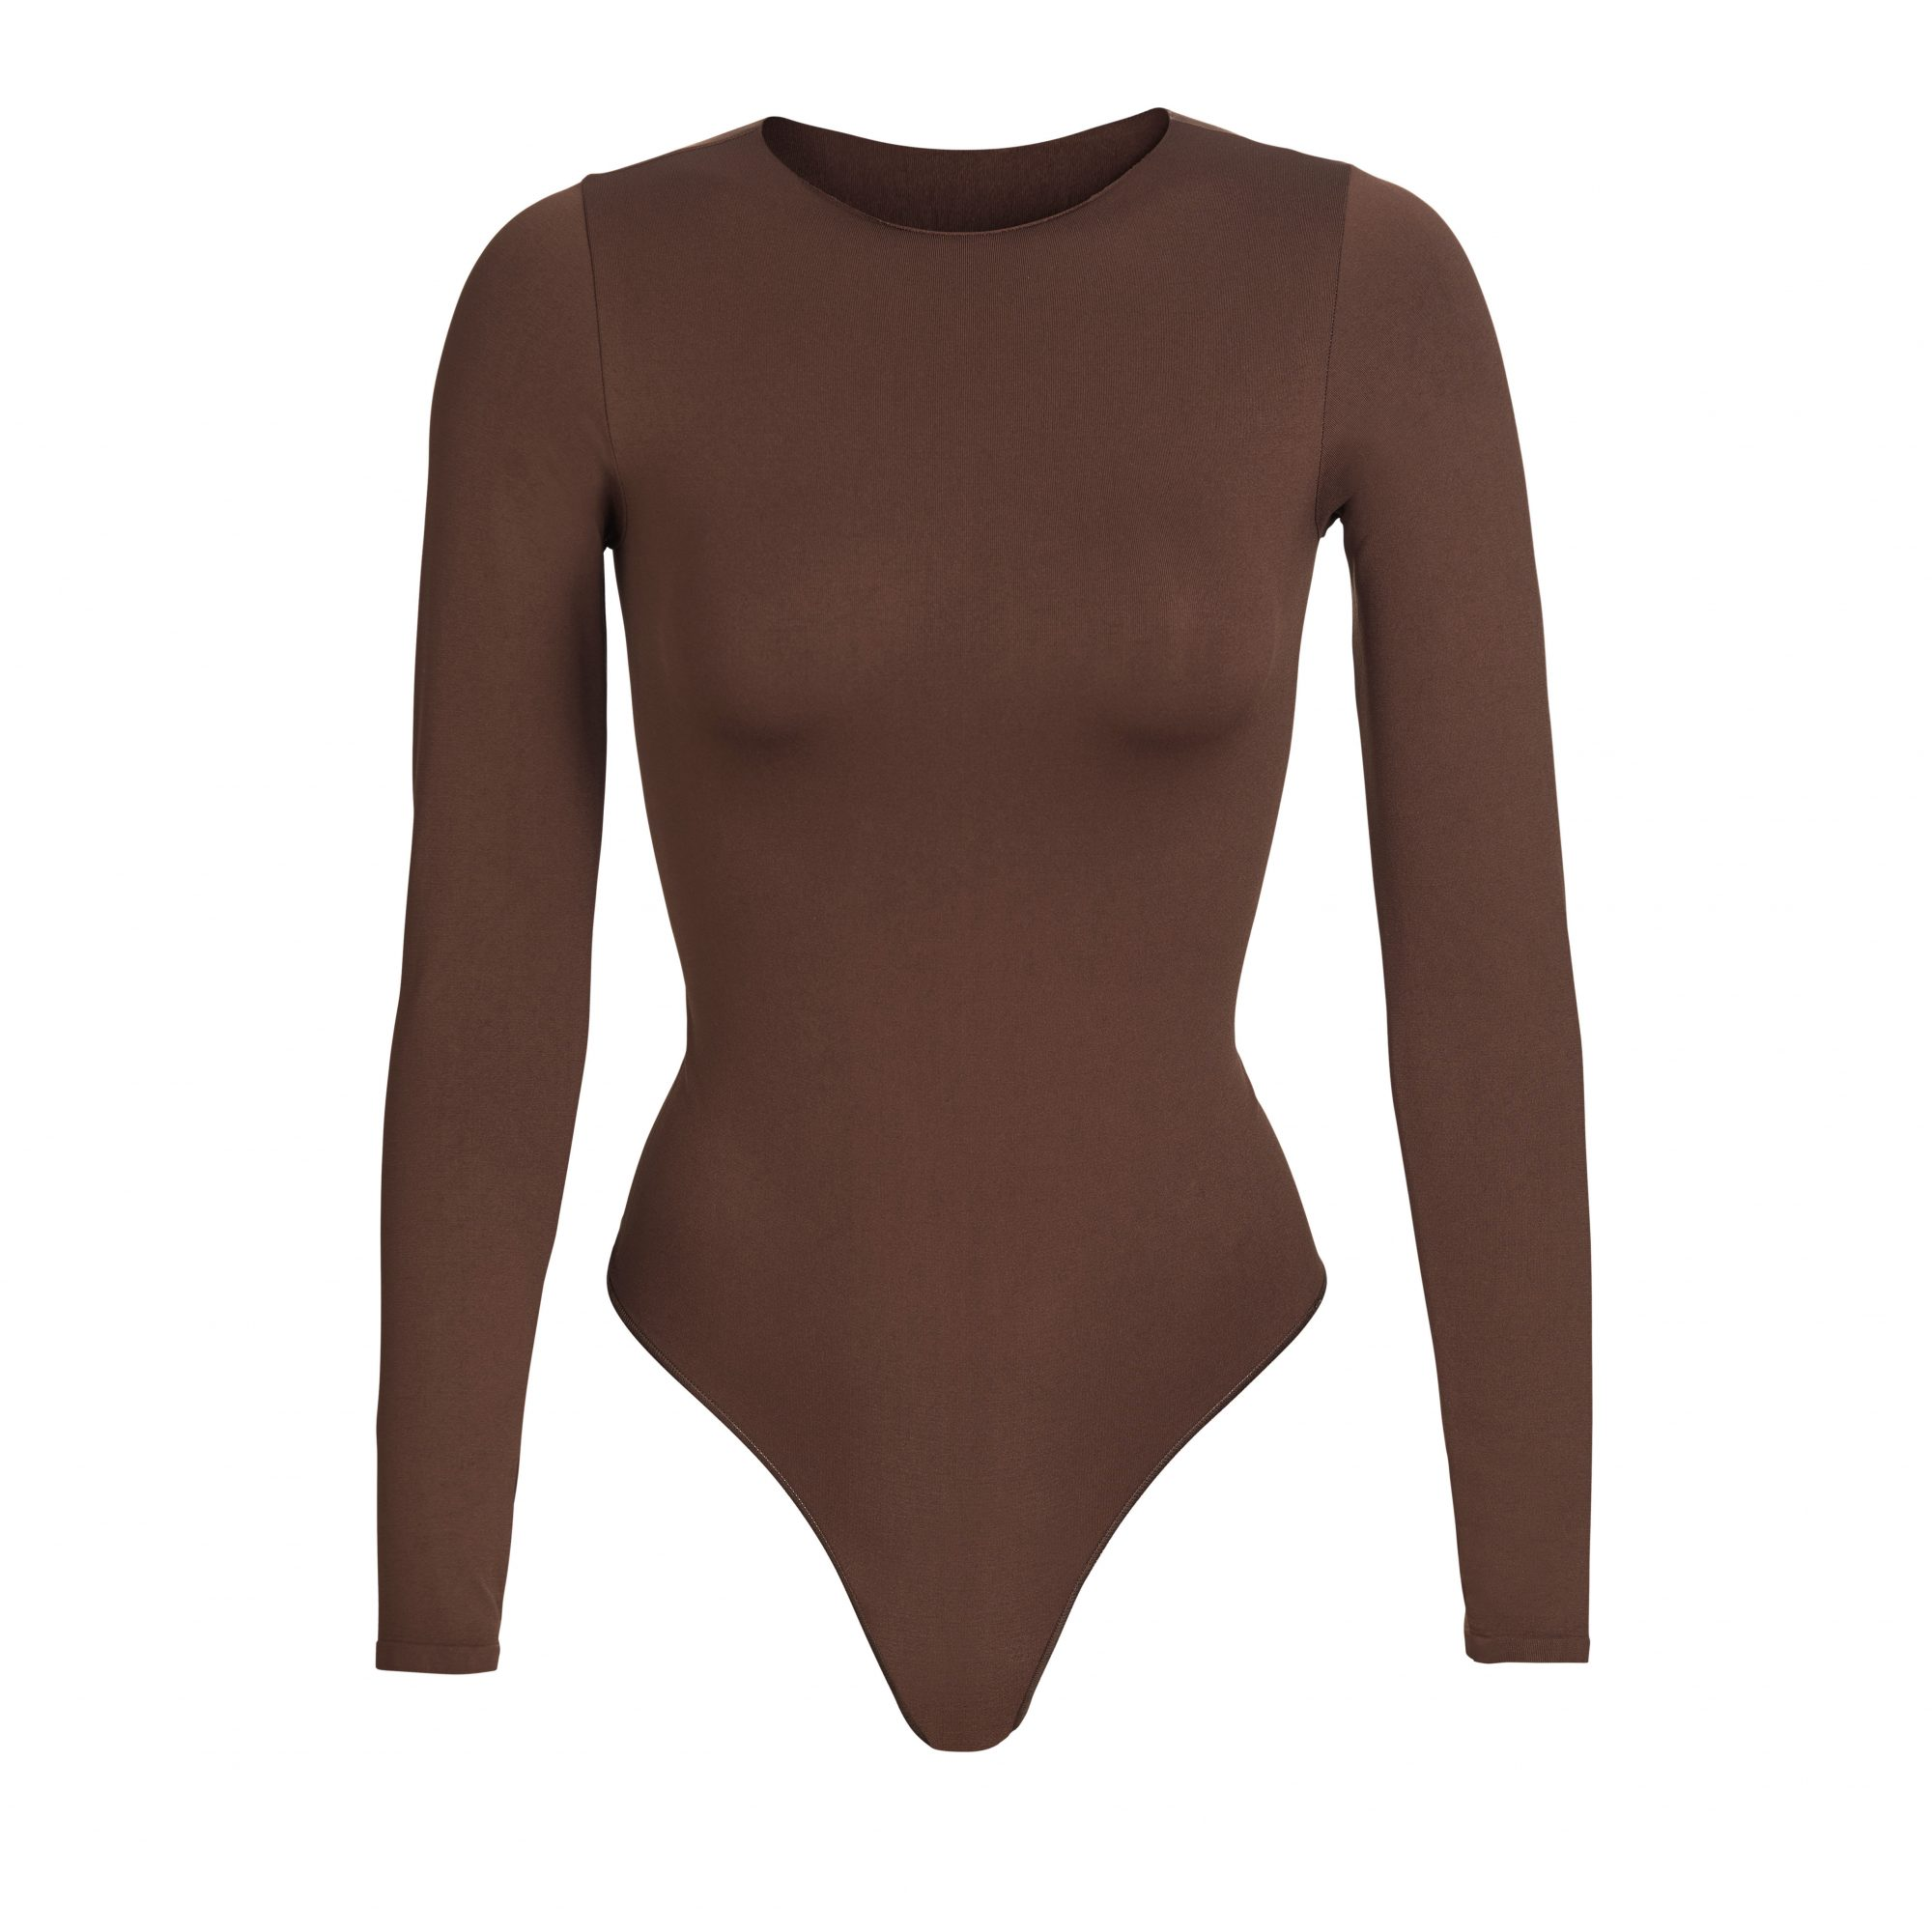 skims-essentials-bodysuit